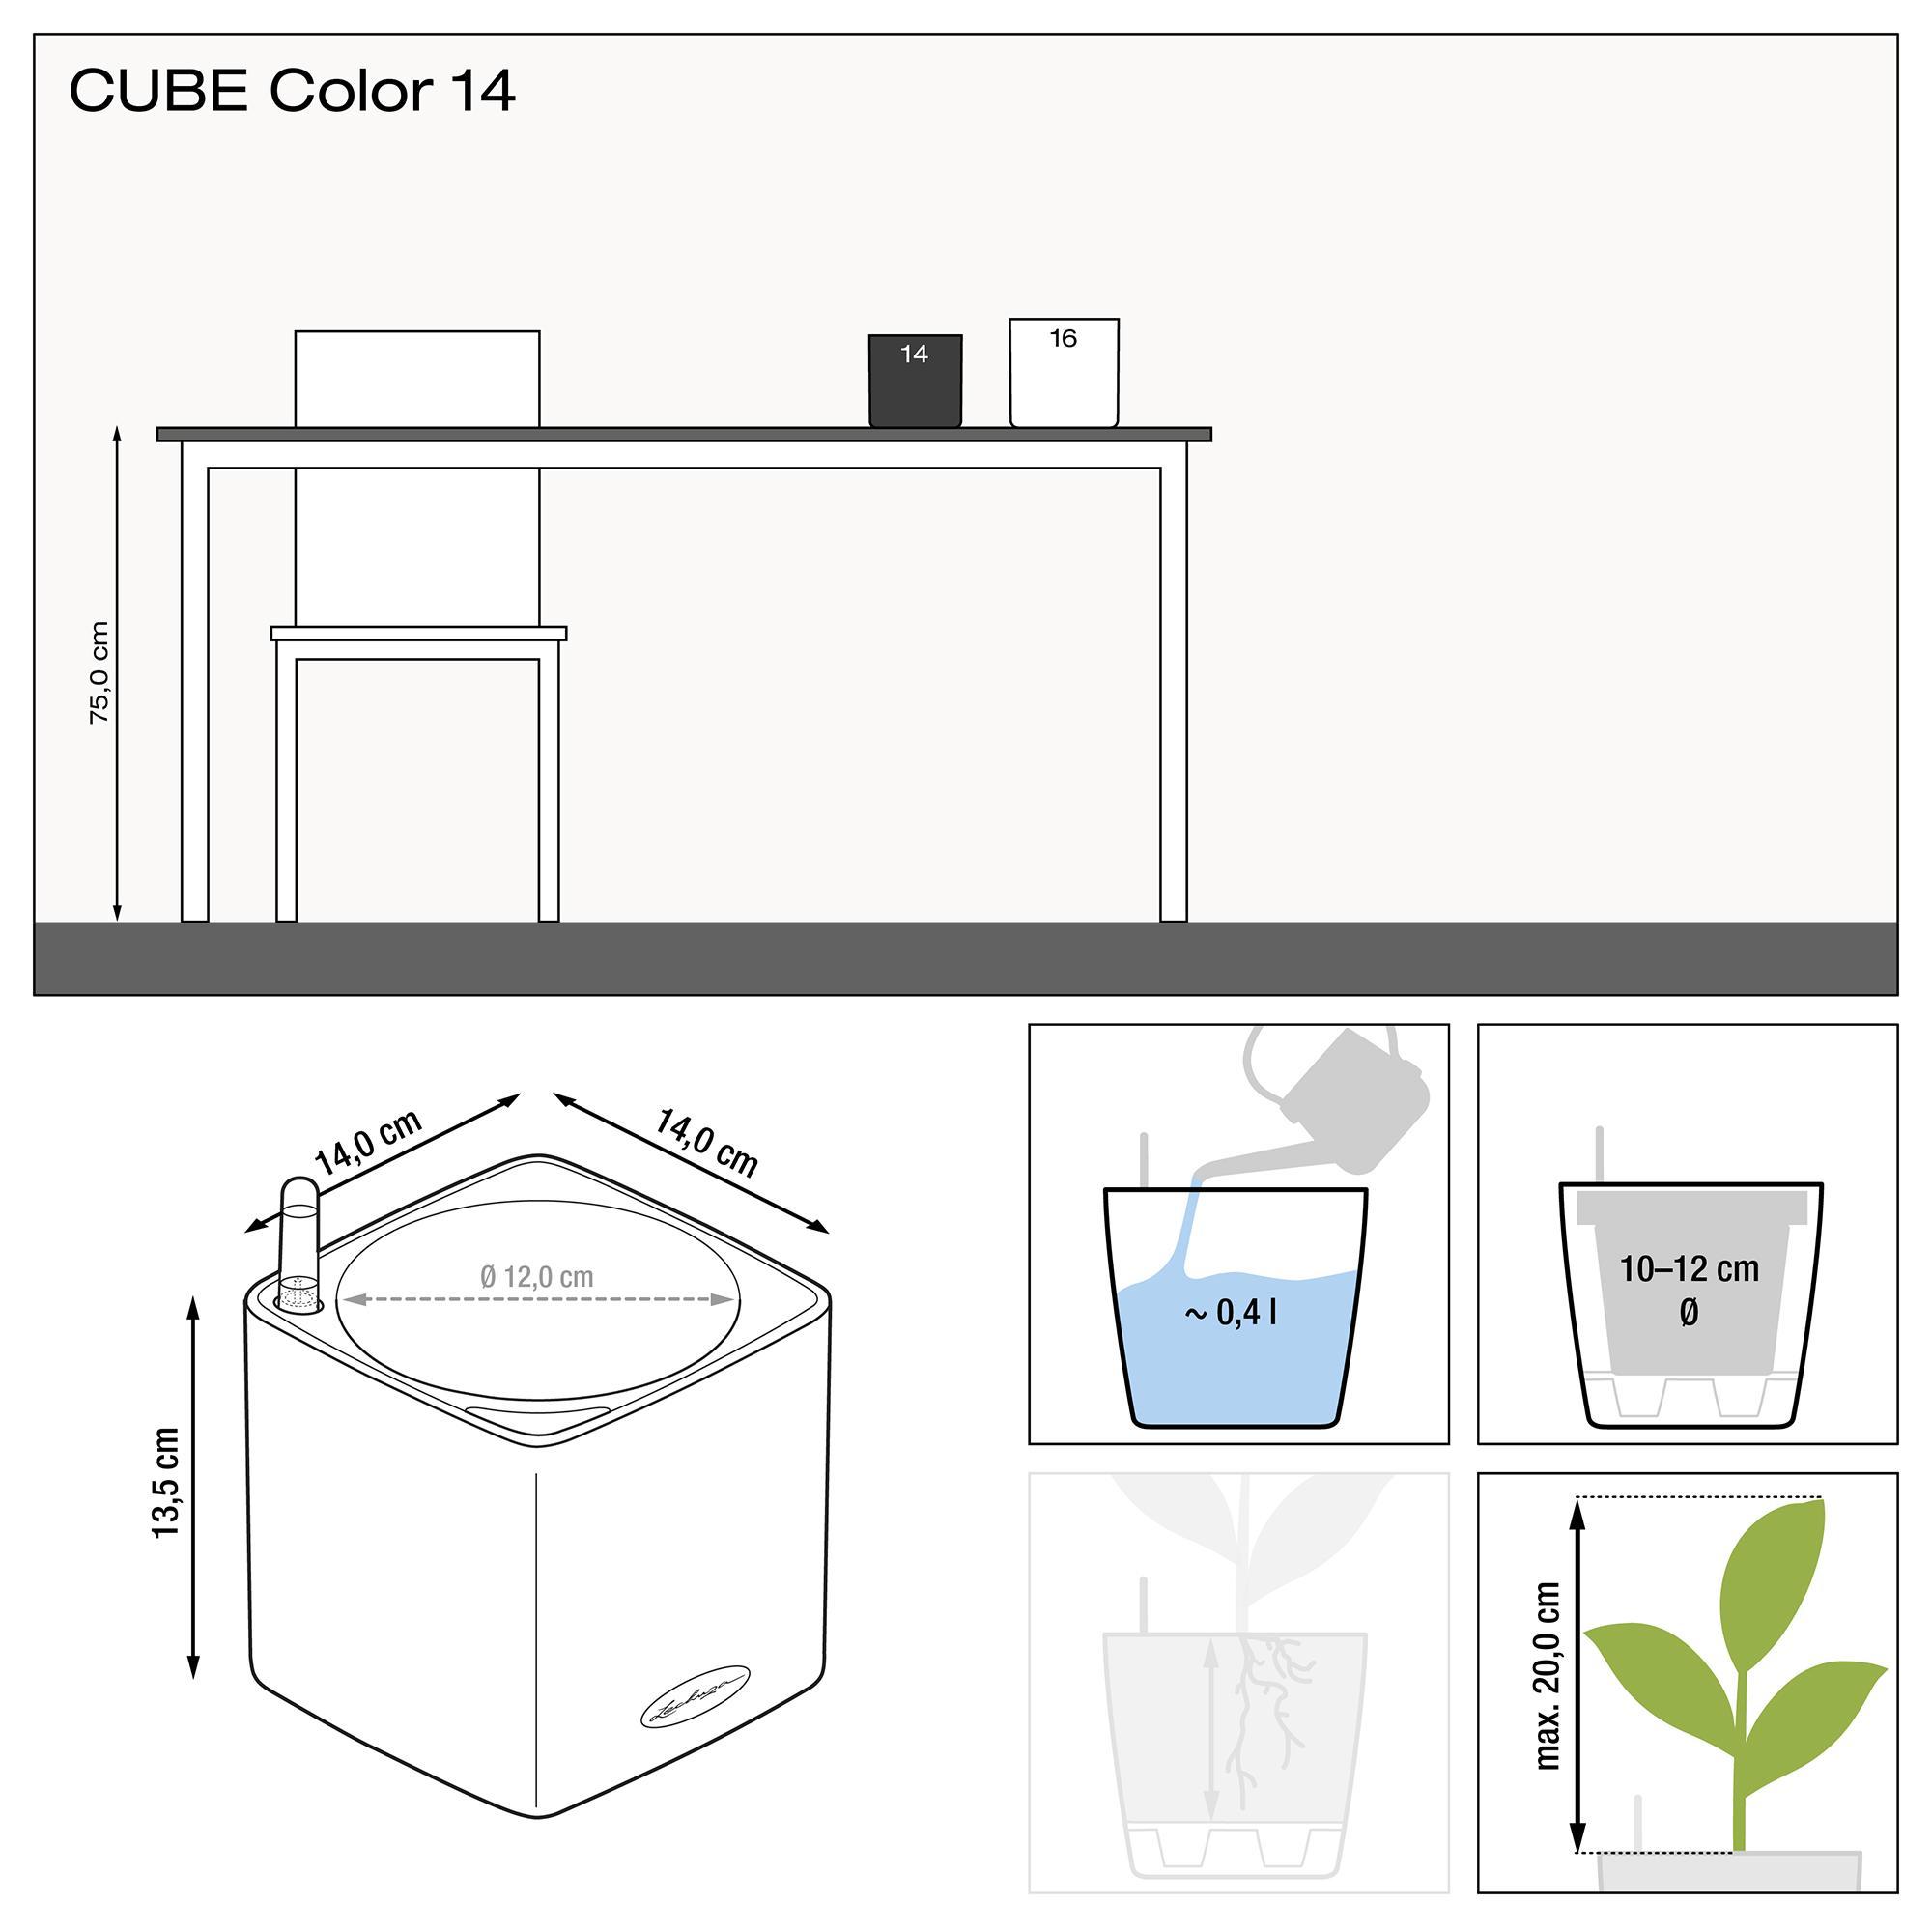 CUBE Color 14 grau - Bild 2